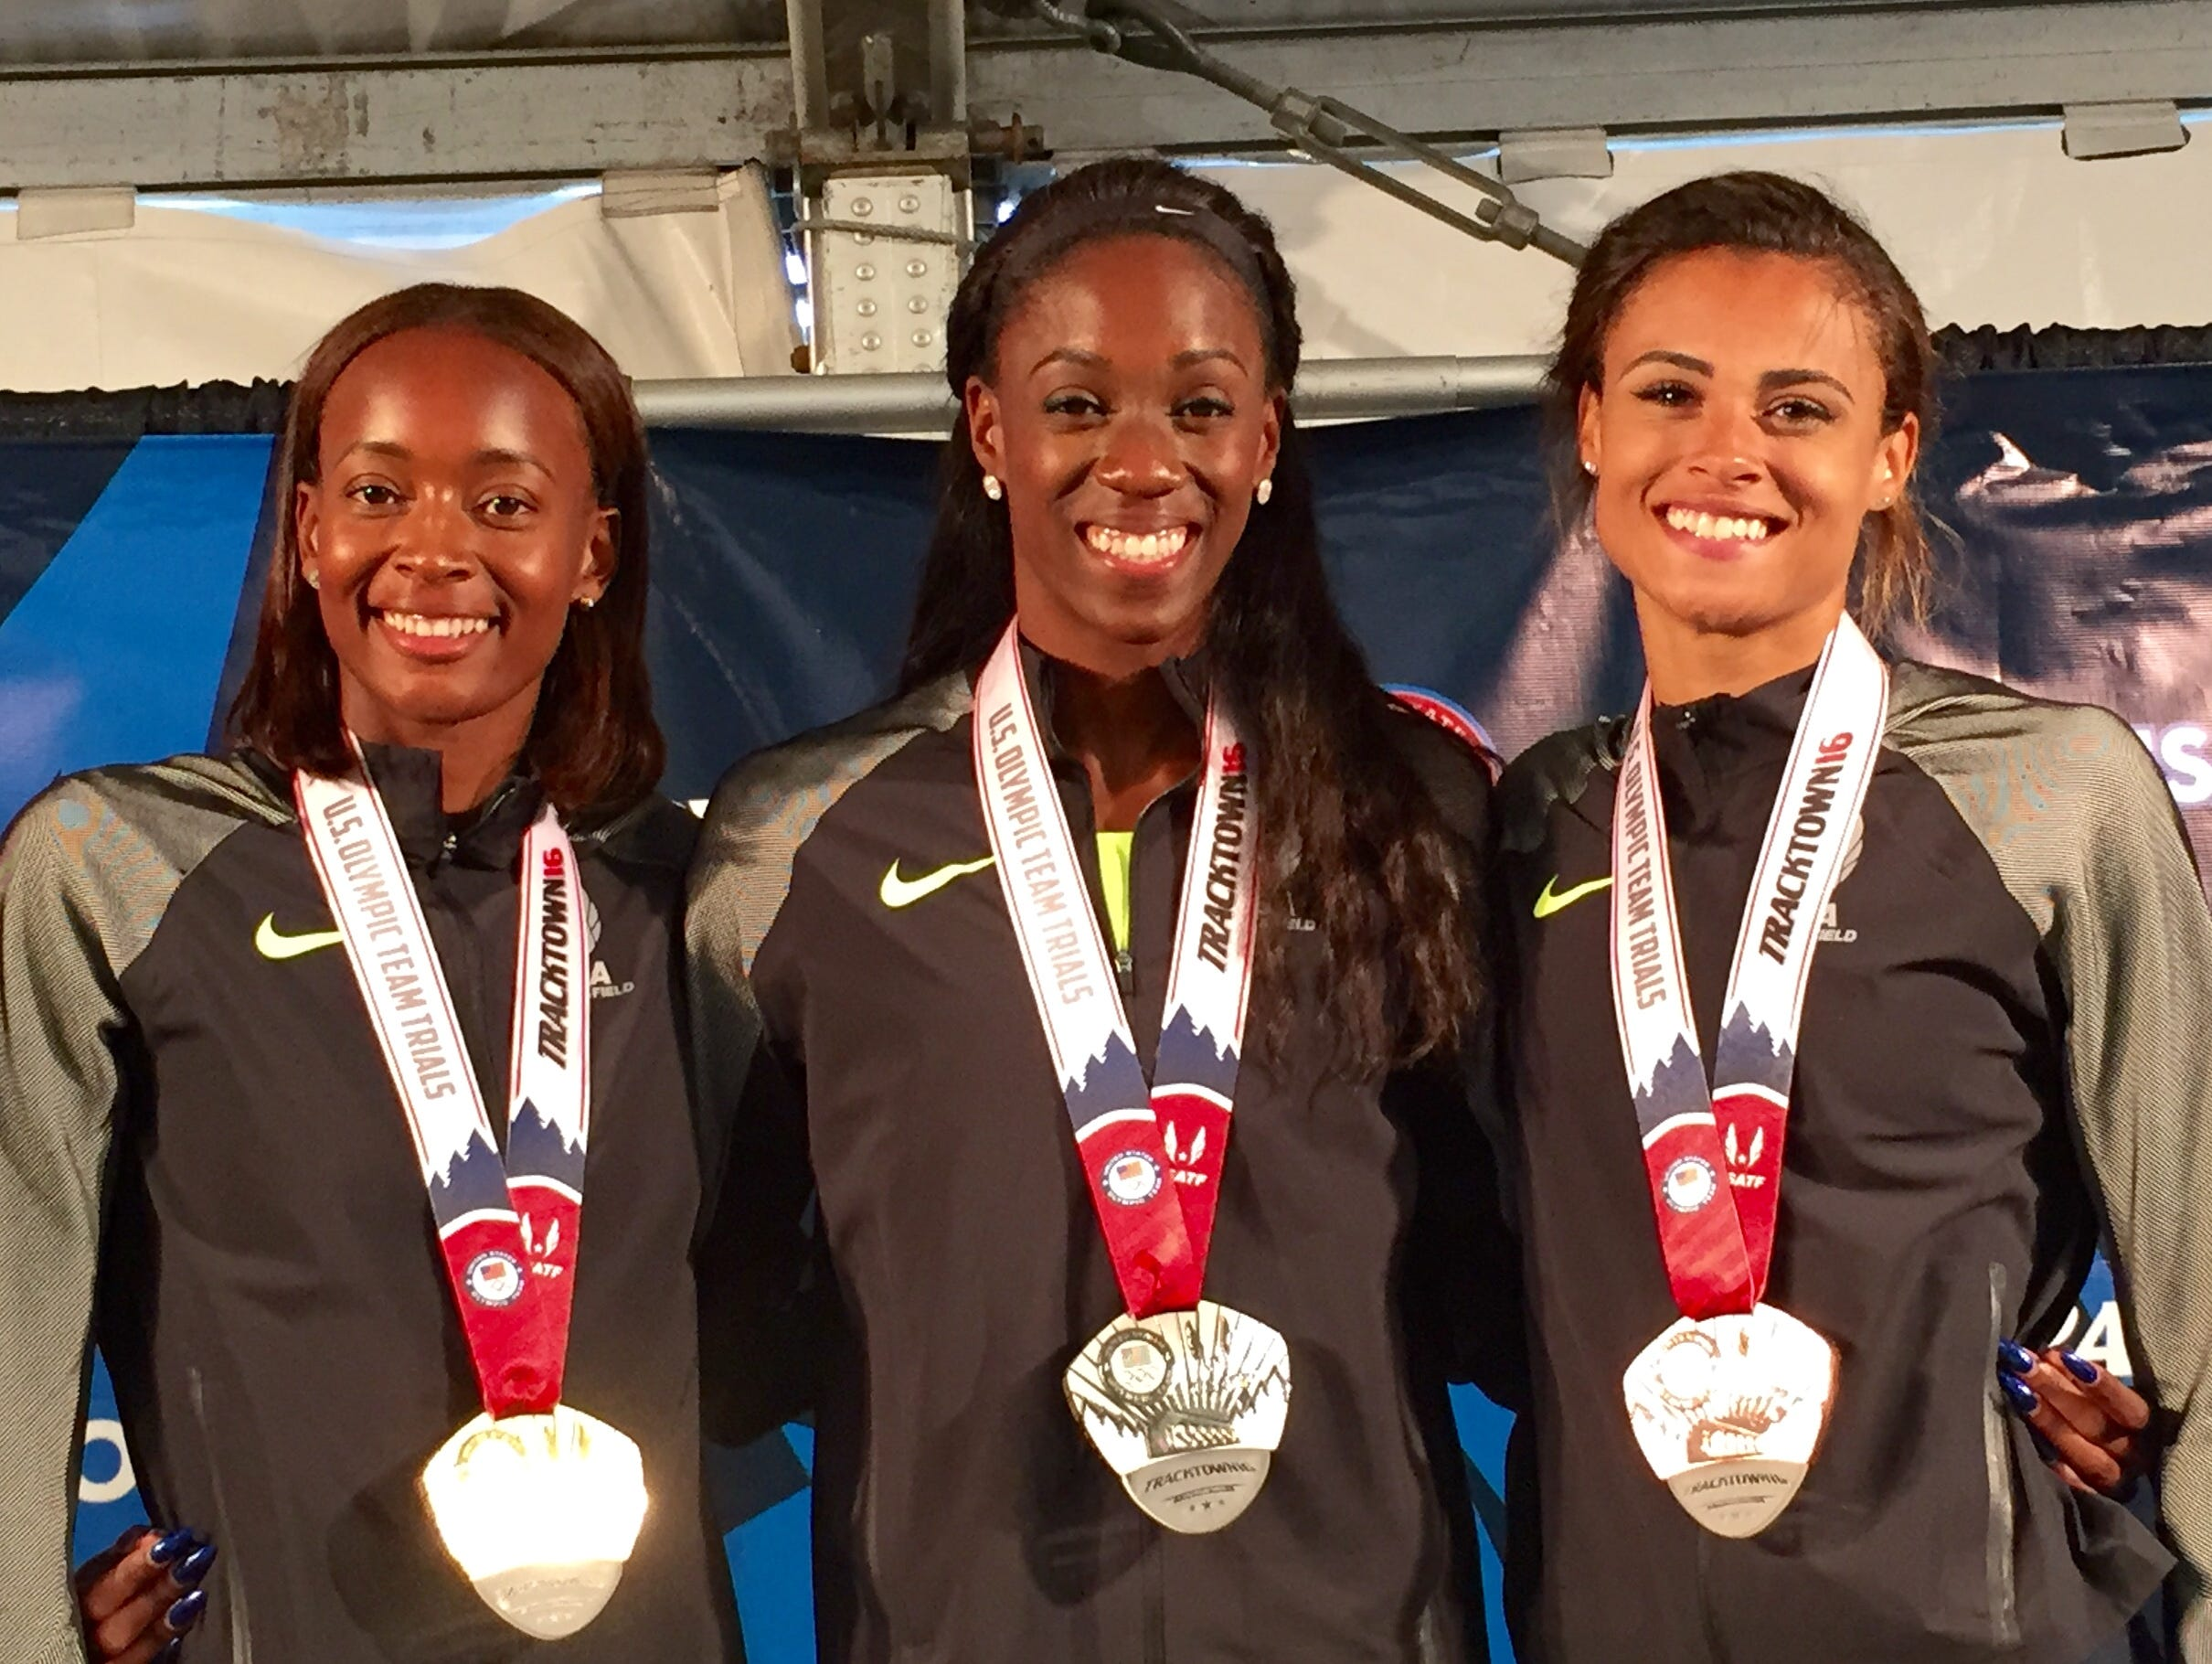 Olympians in 400-meter hurdles: From left, Dalilah Muhammad, Ashley Spencer, Sydney McLaughlin